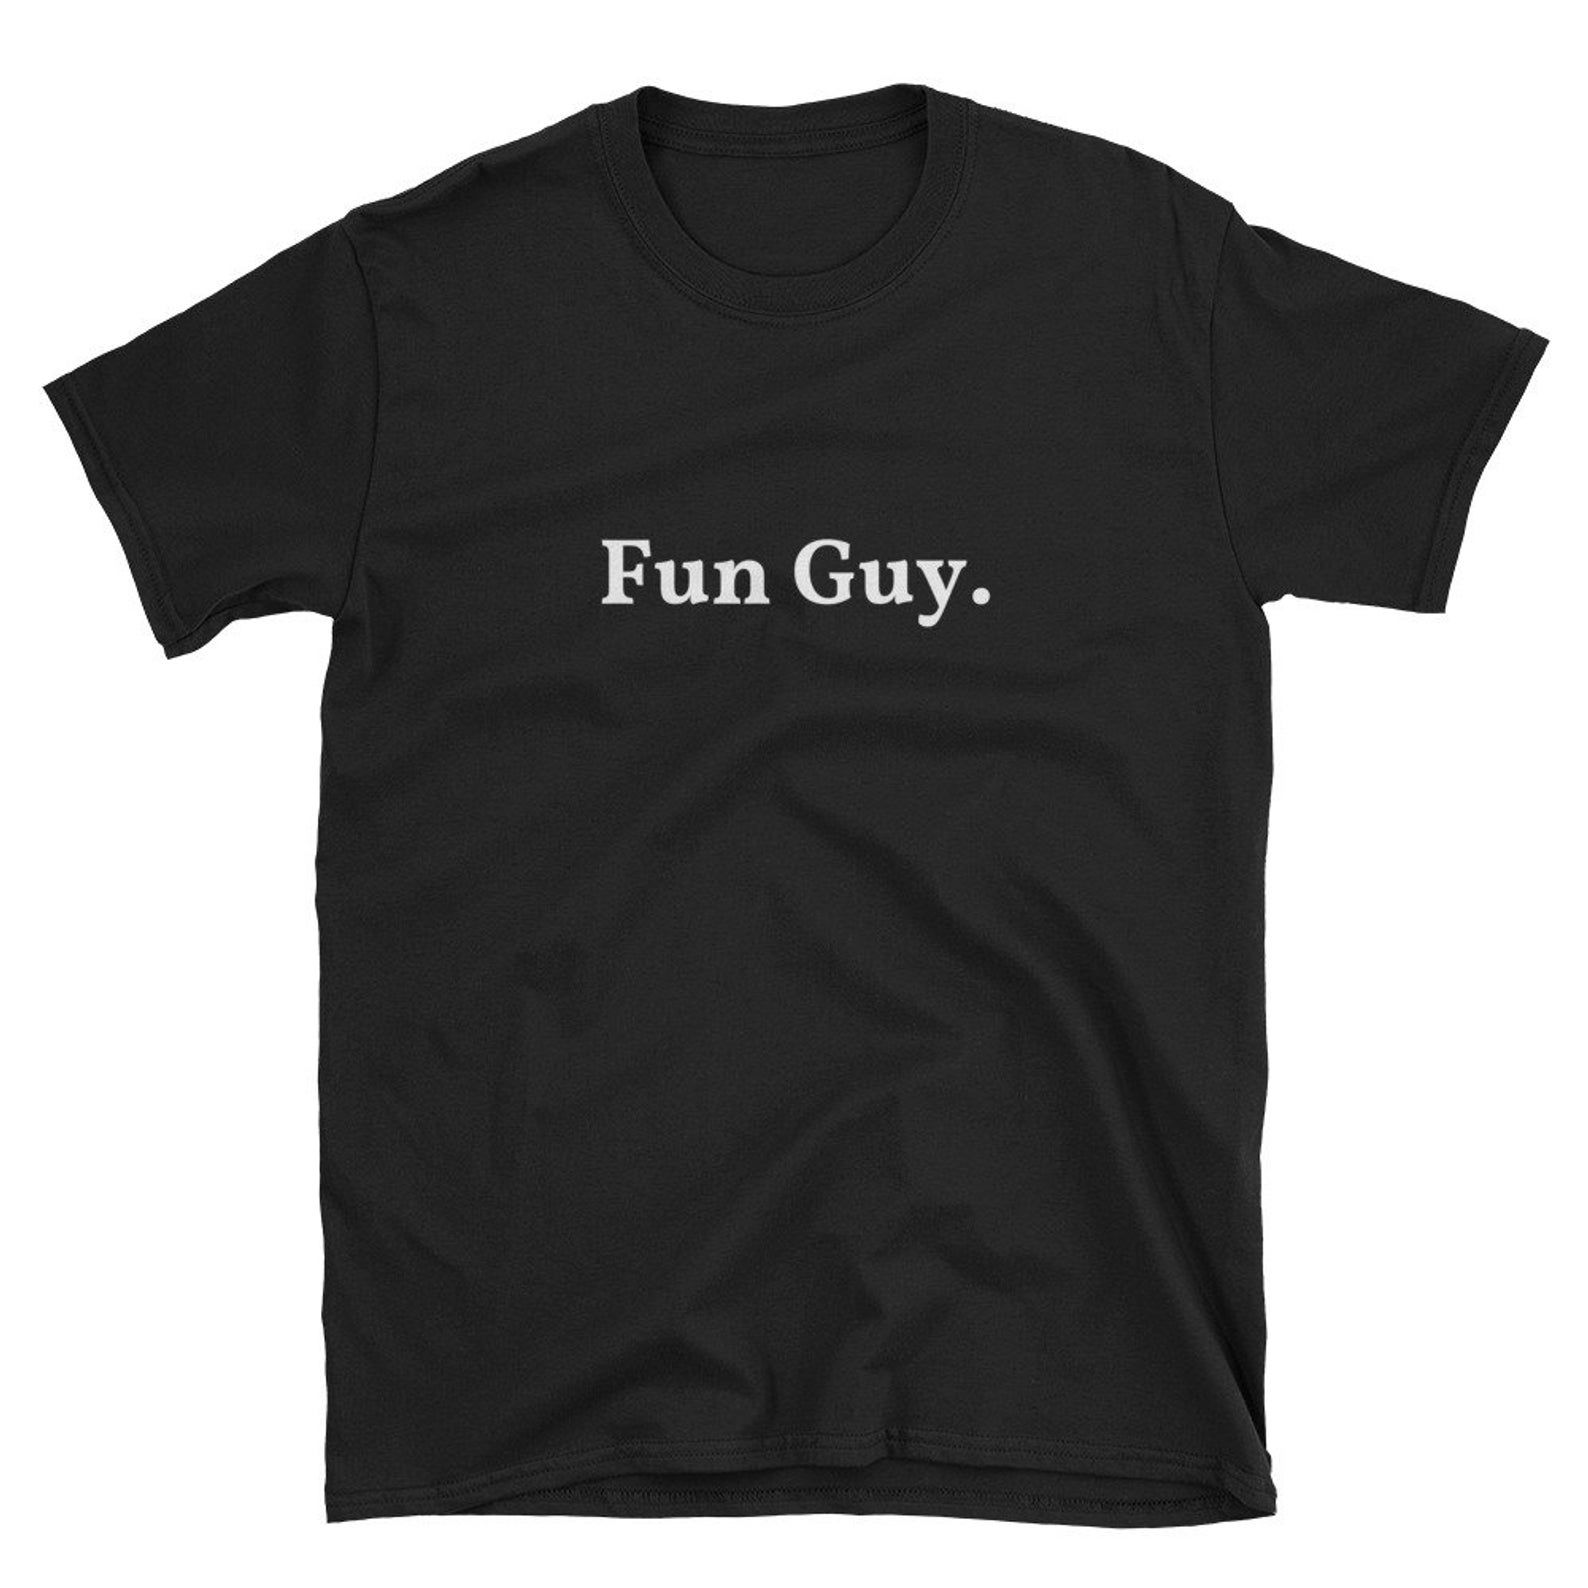 fd00f843d2c Fun Guy Kawhi Leonard New Balance Shirt Im a fun guy shirt Toronto Raptors  NBA Nba champions T-Shirt